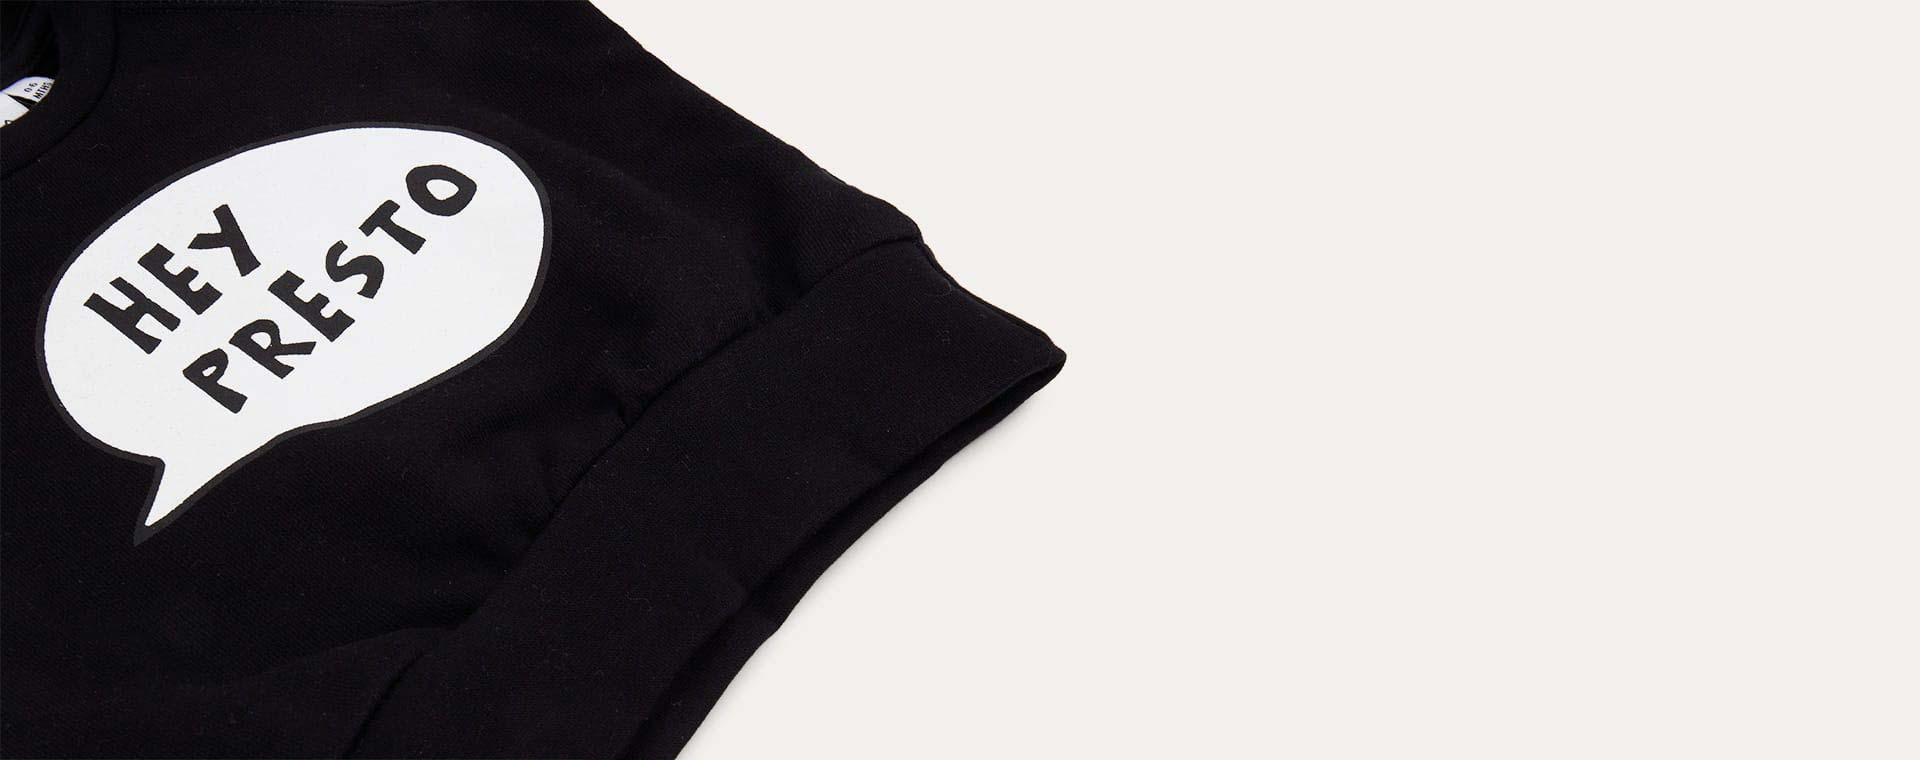 Black tobias & the bear Hey Presto Sweatshirt